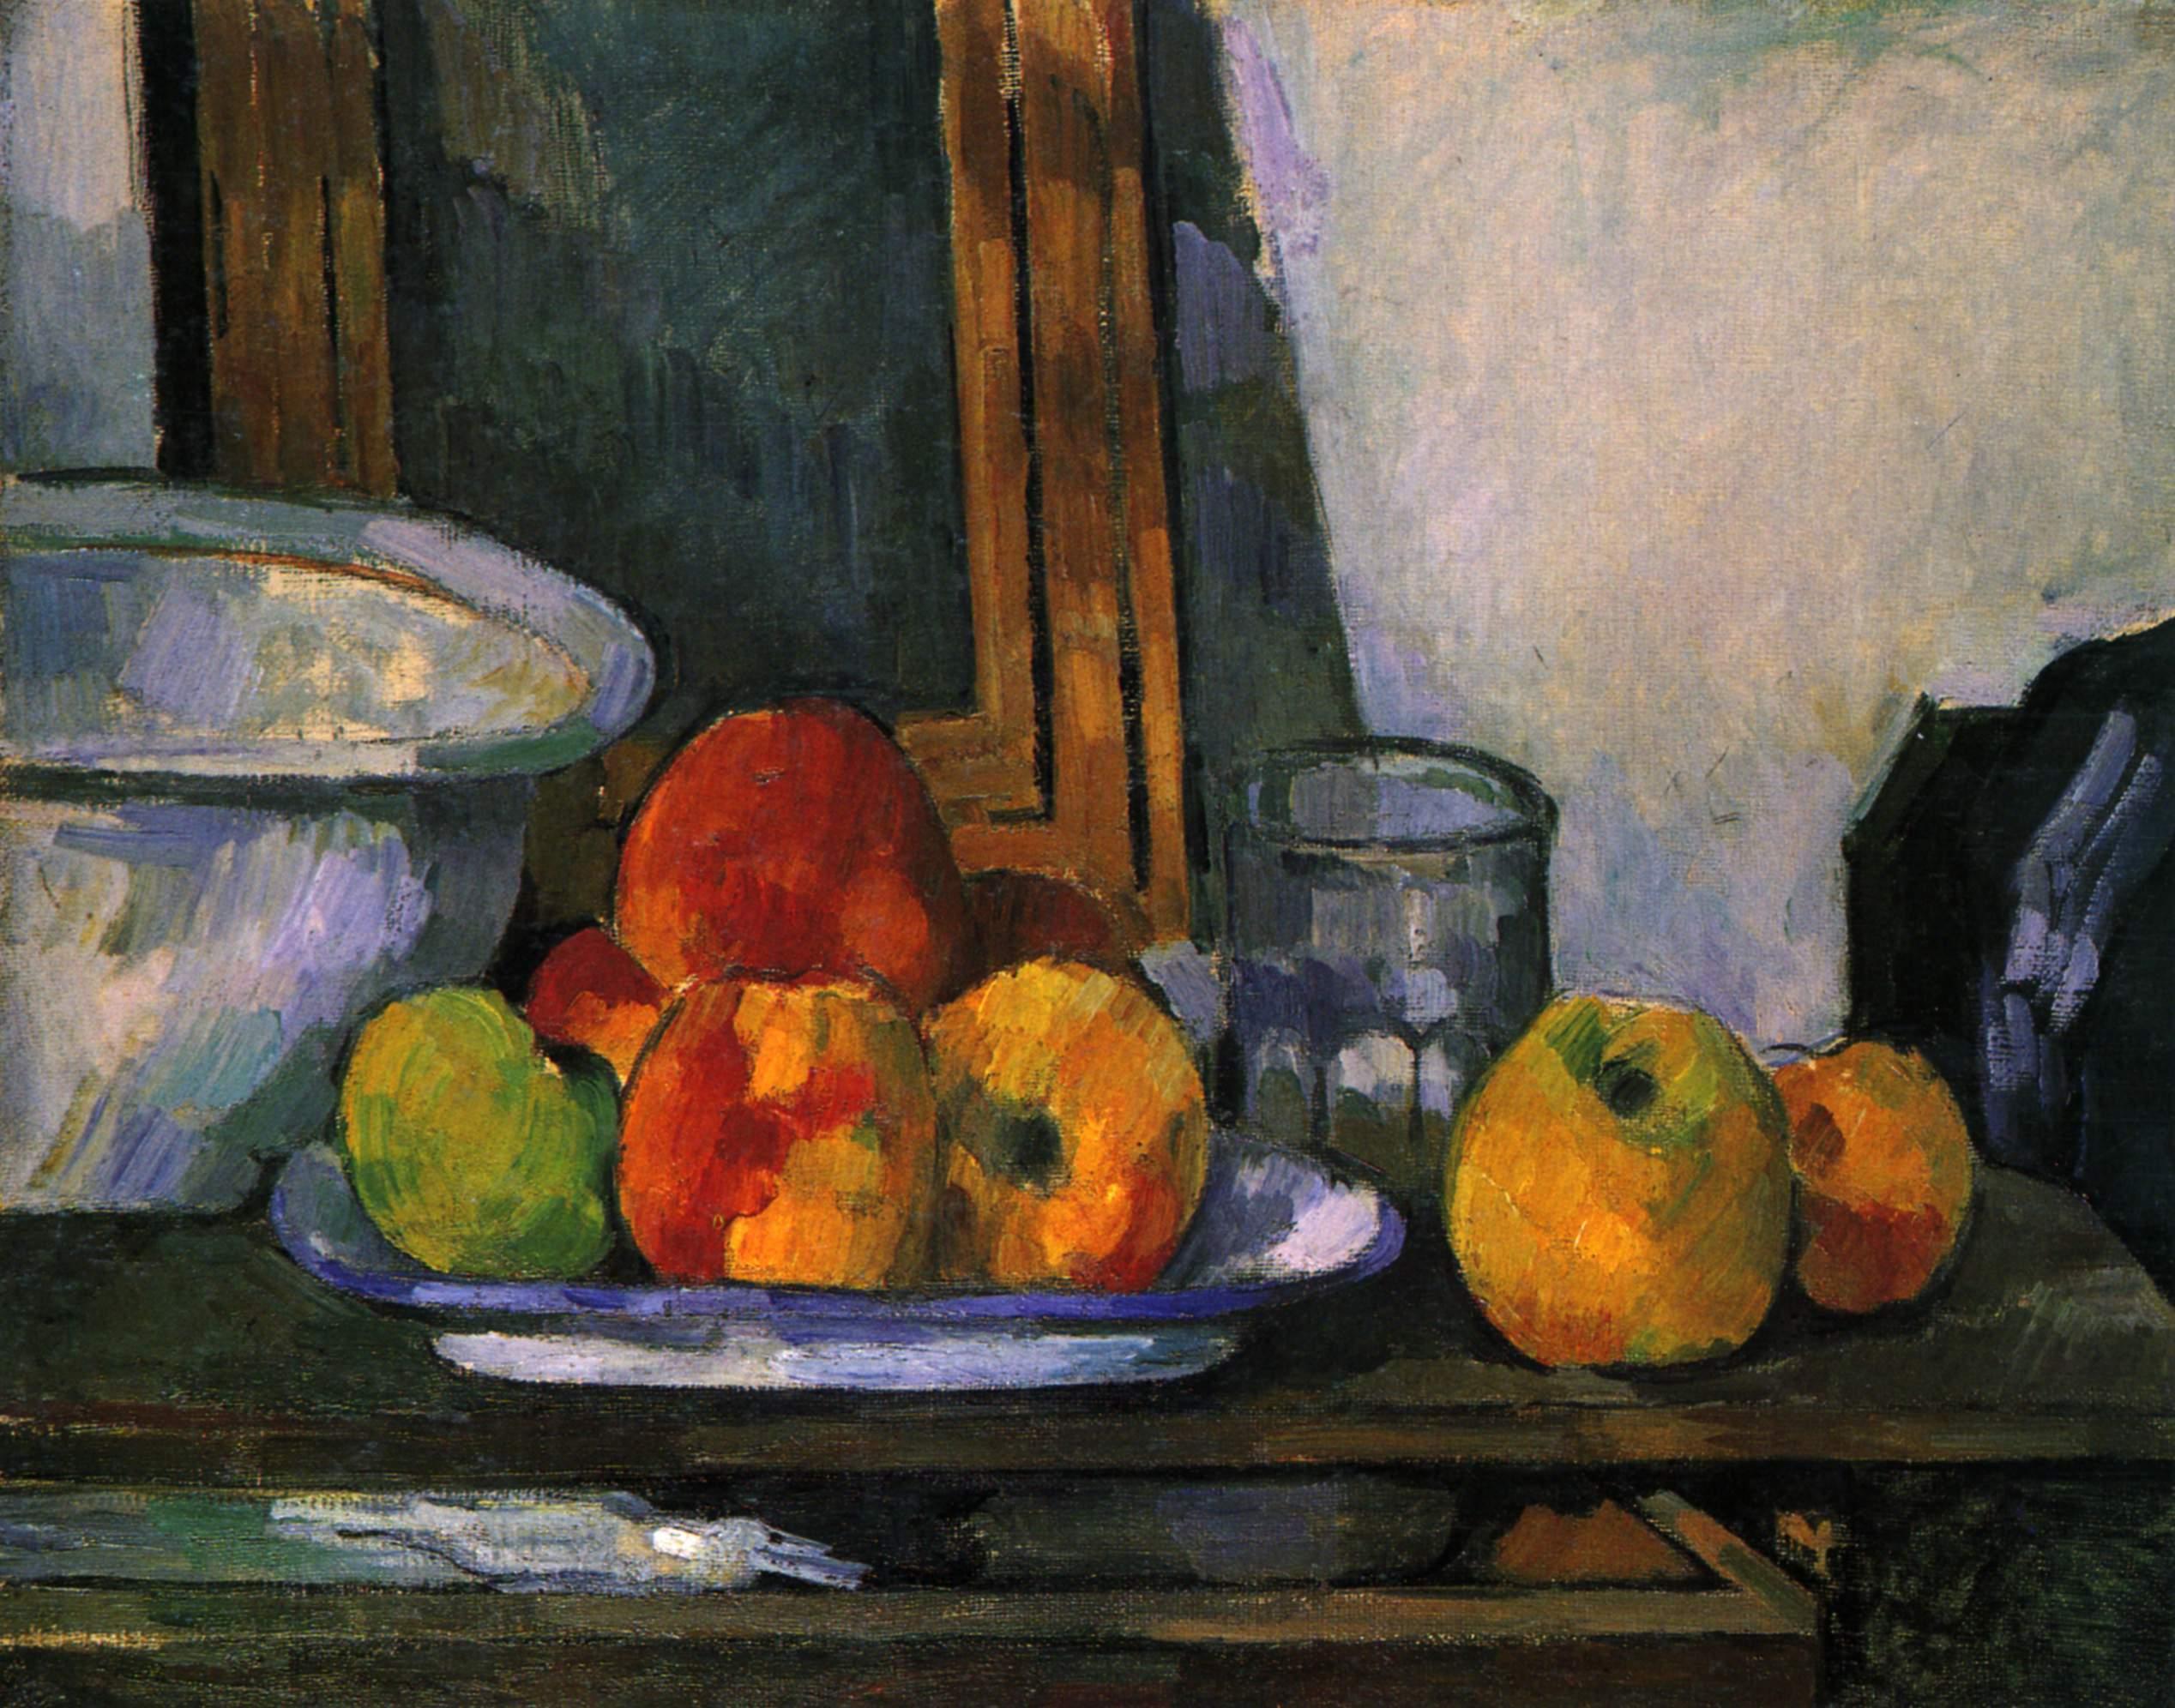 Художник Поль Сезанн Paull Cezanne натюрморт nature morte пейзажи природы Альберт Сафиуллин